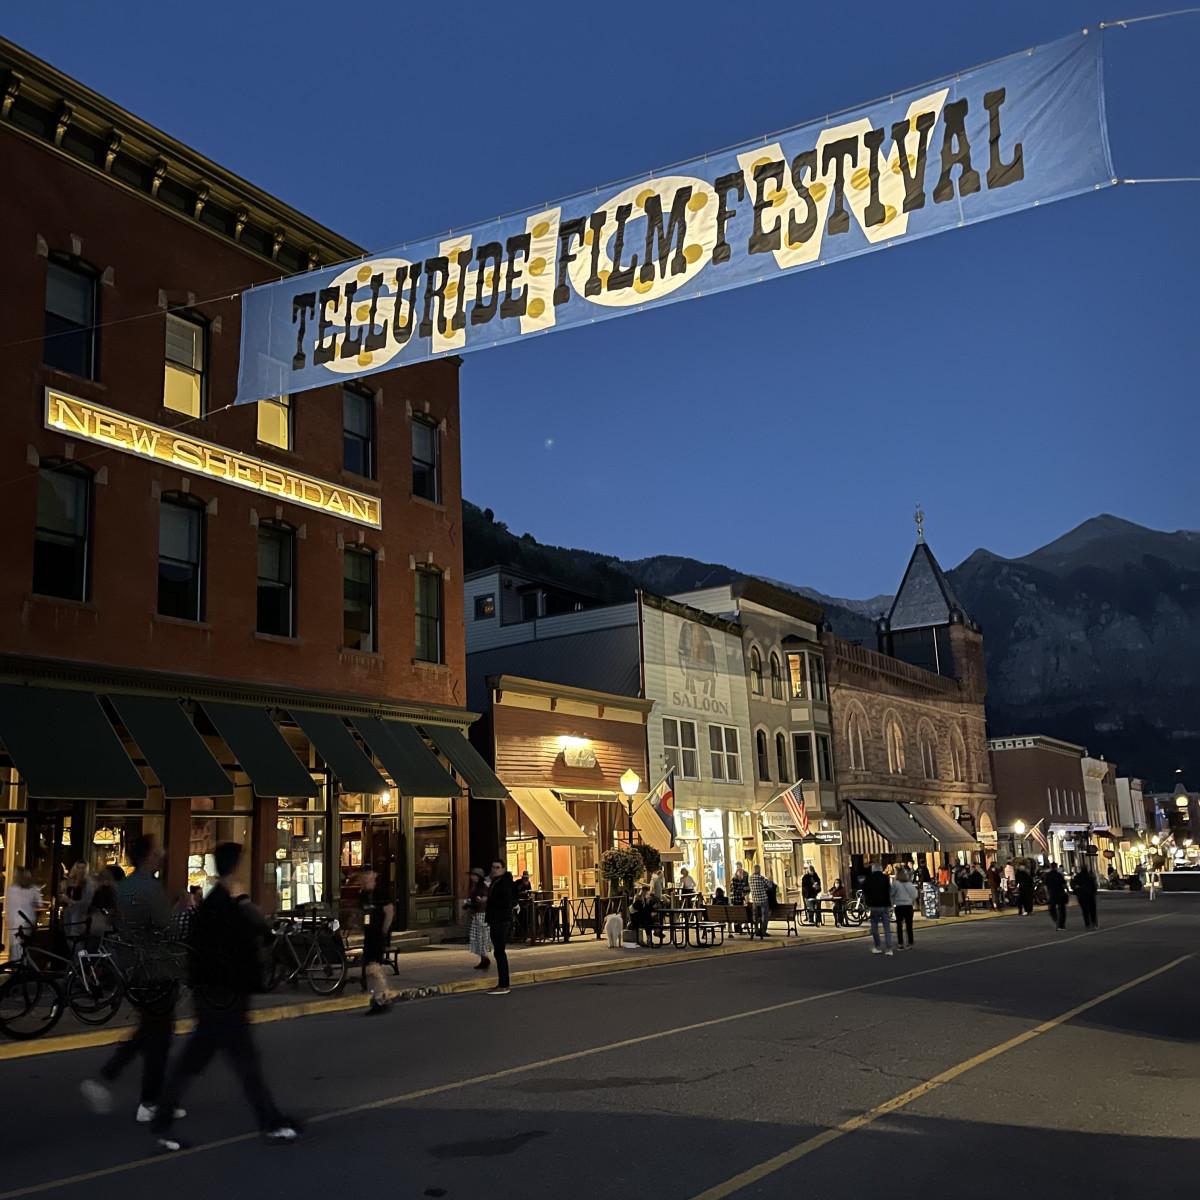 Last night of the Telluride Film Festival 2021 - Photo by Christopher Schiller